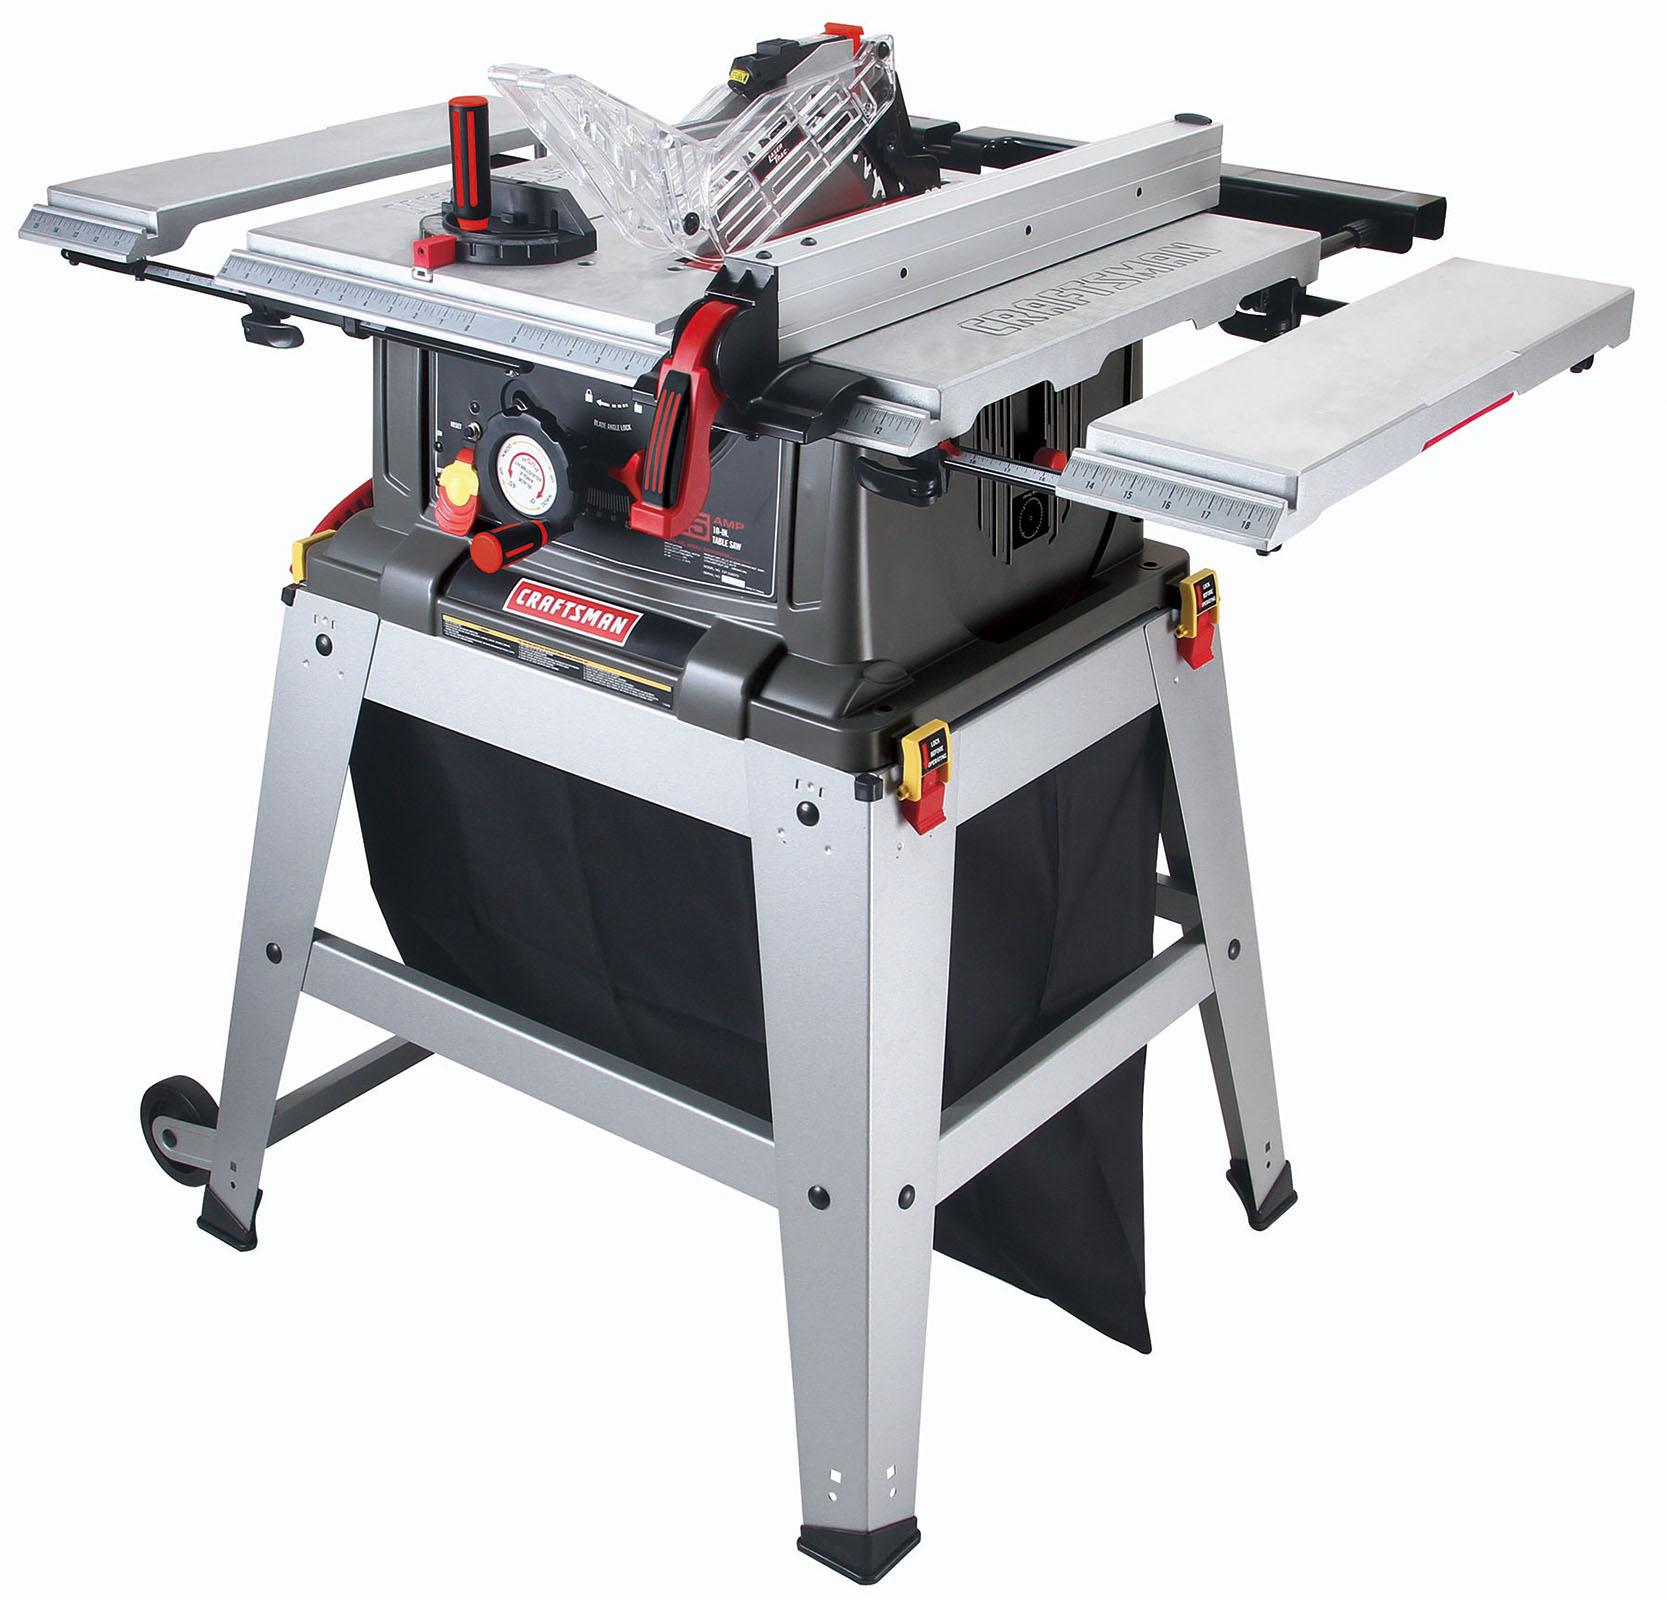 Craftsman Table Saw Safety Key